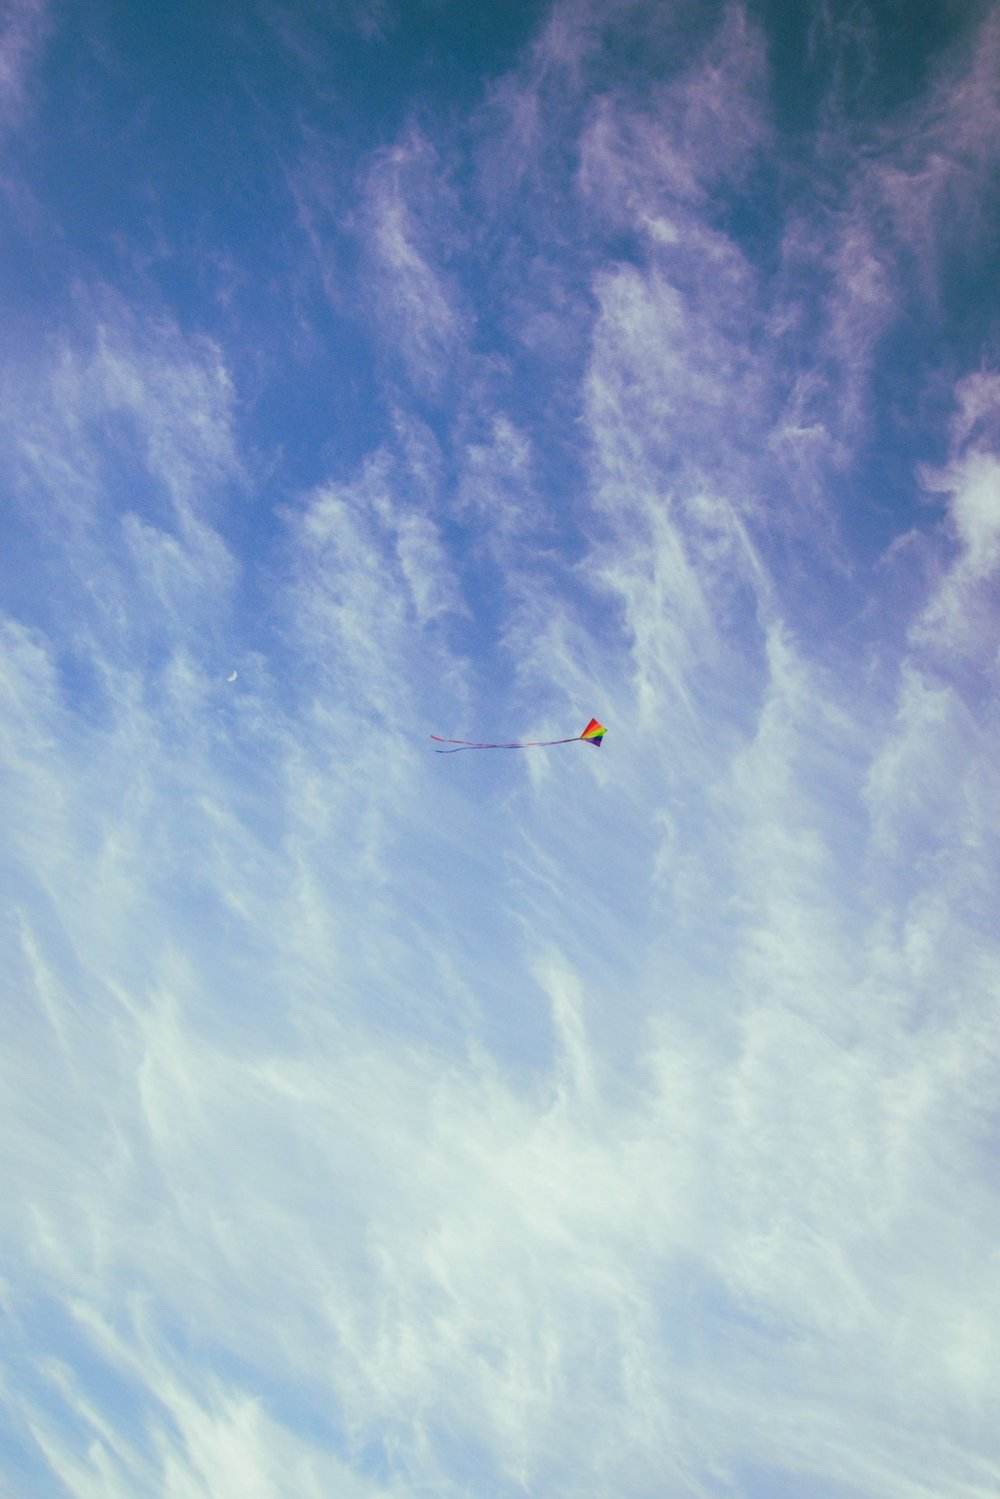 kite-moon-sky-clouds-80398.jpeg